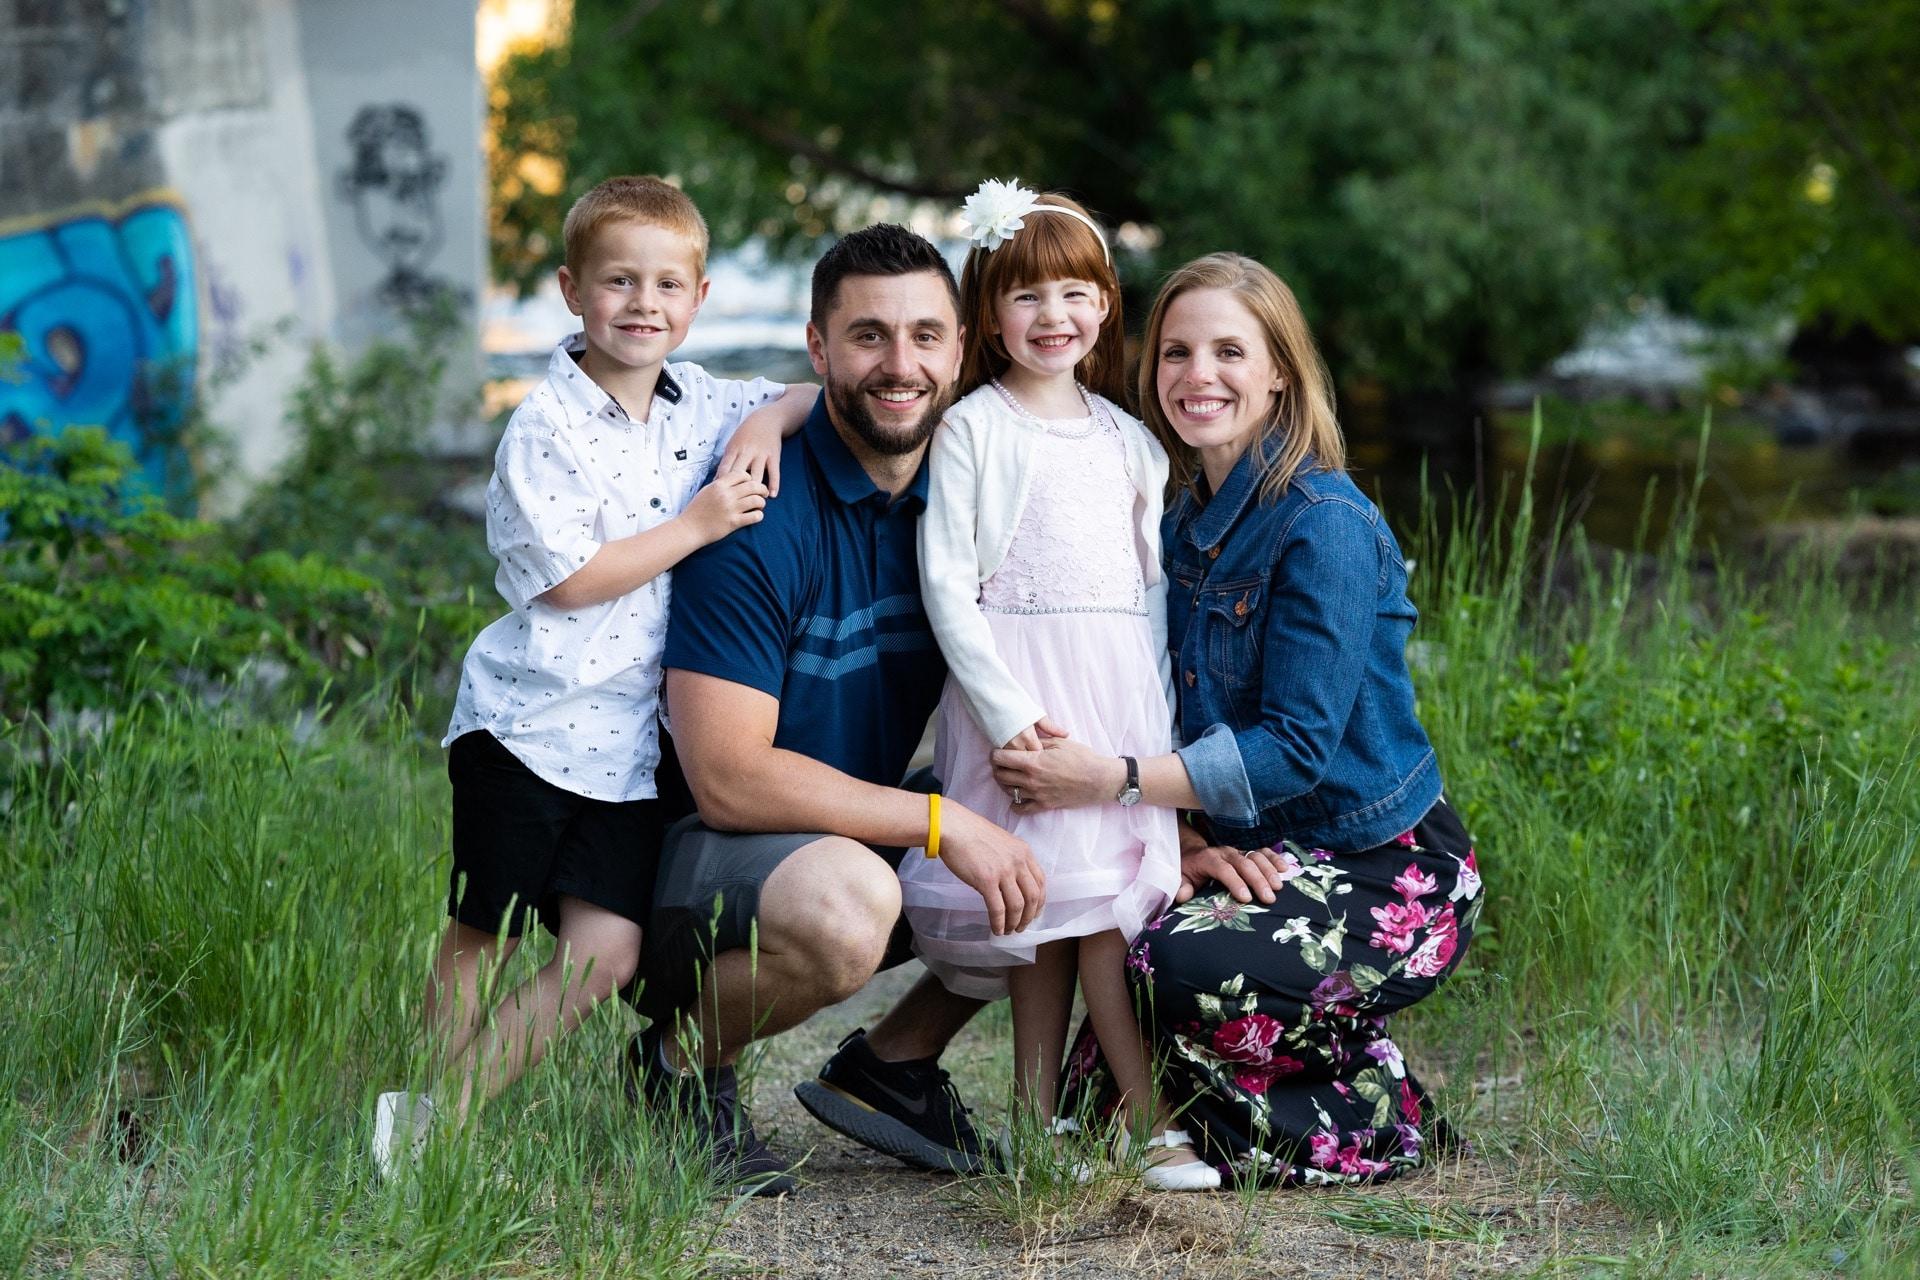 Spokane family photo photographer in Spokane, WA